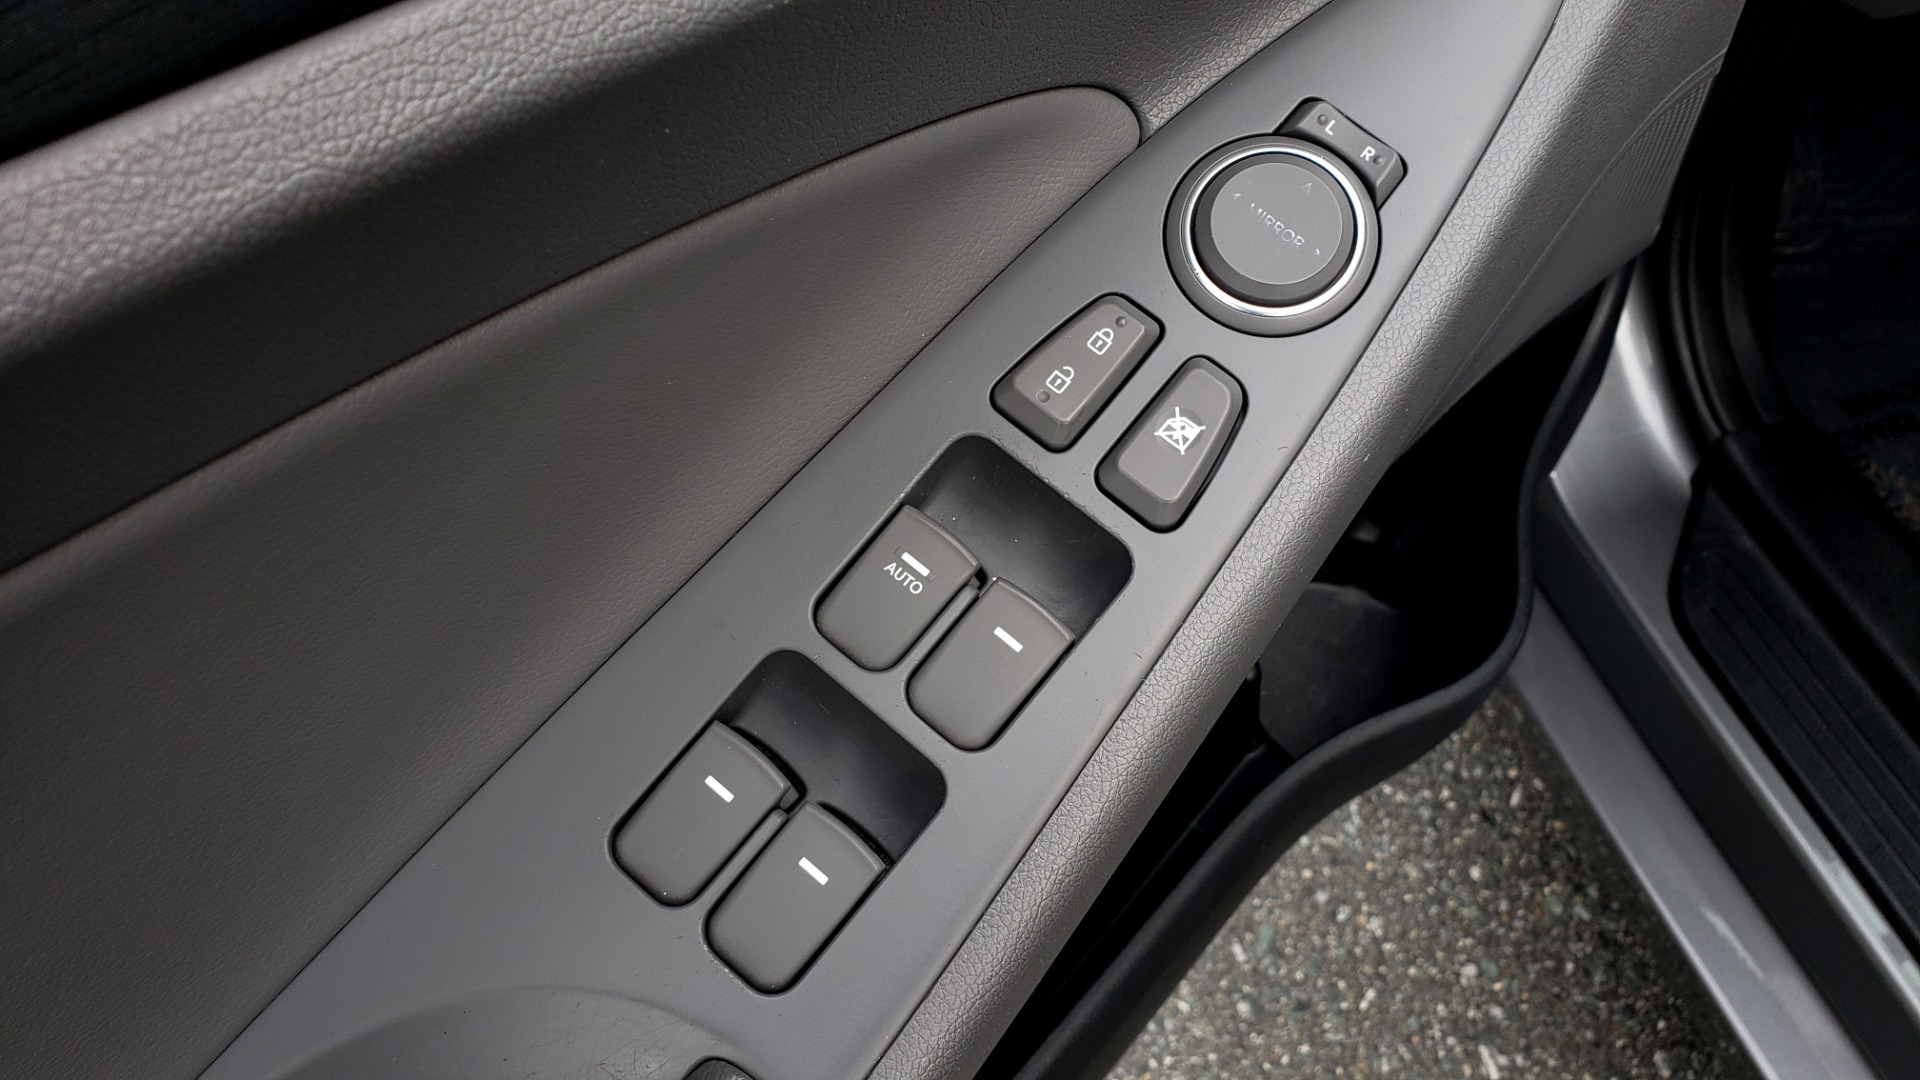 Used 2013 Hyundai SONATA SE AUTO / 2.4L 4-CYL / 6-SPD AUTO / VERY CLEAN for sale Sold at Formula Imports in Charlotte NC 28227 33